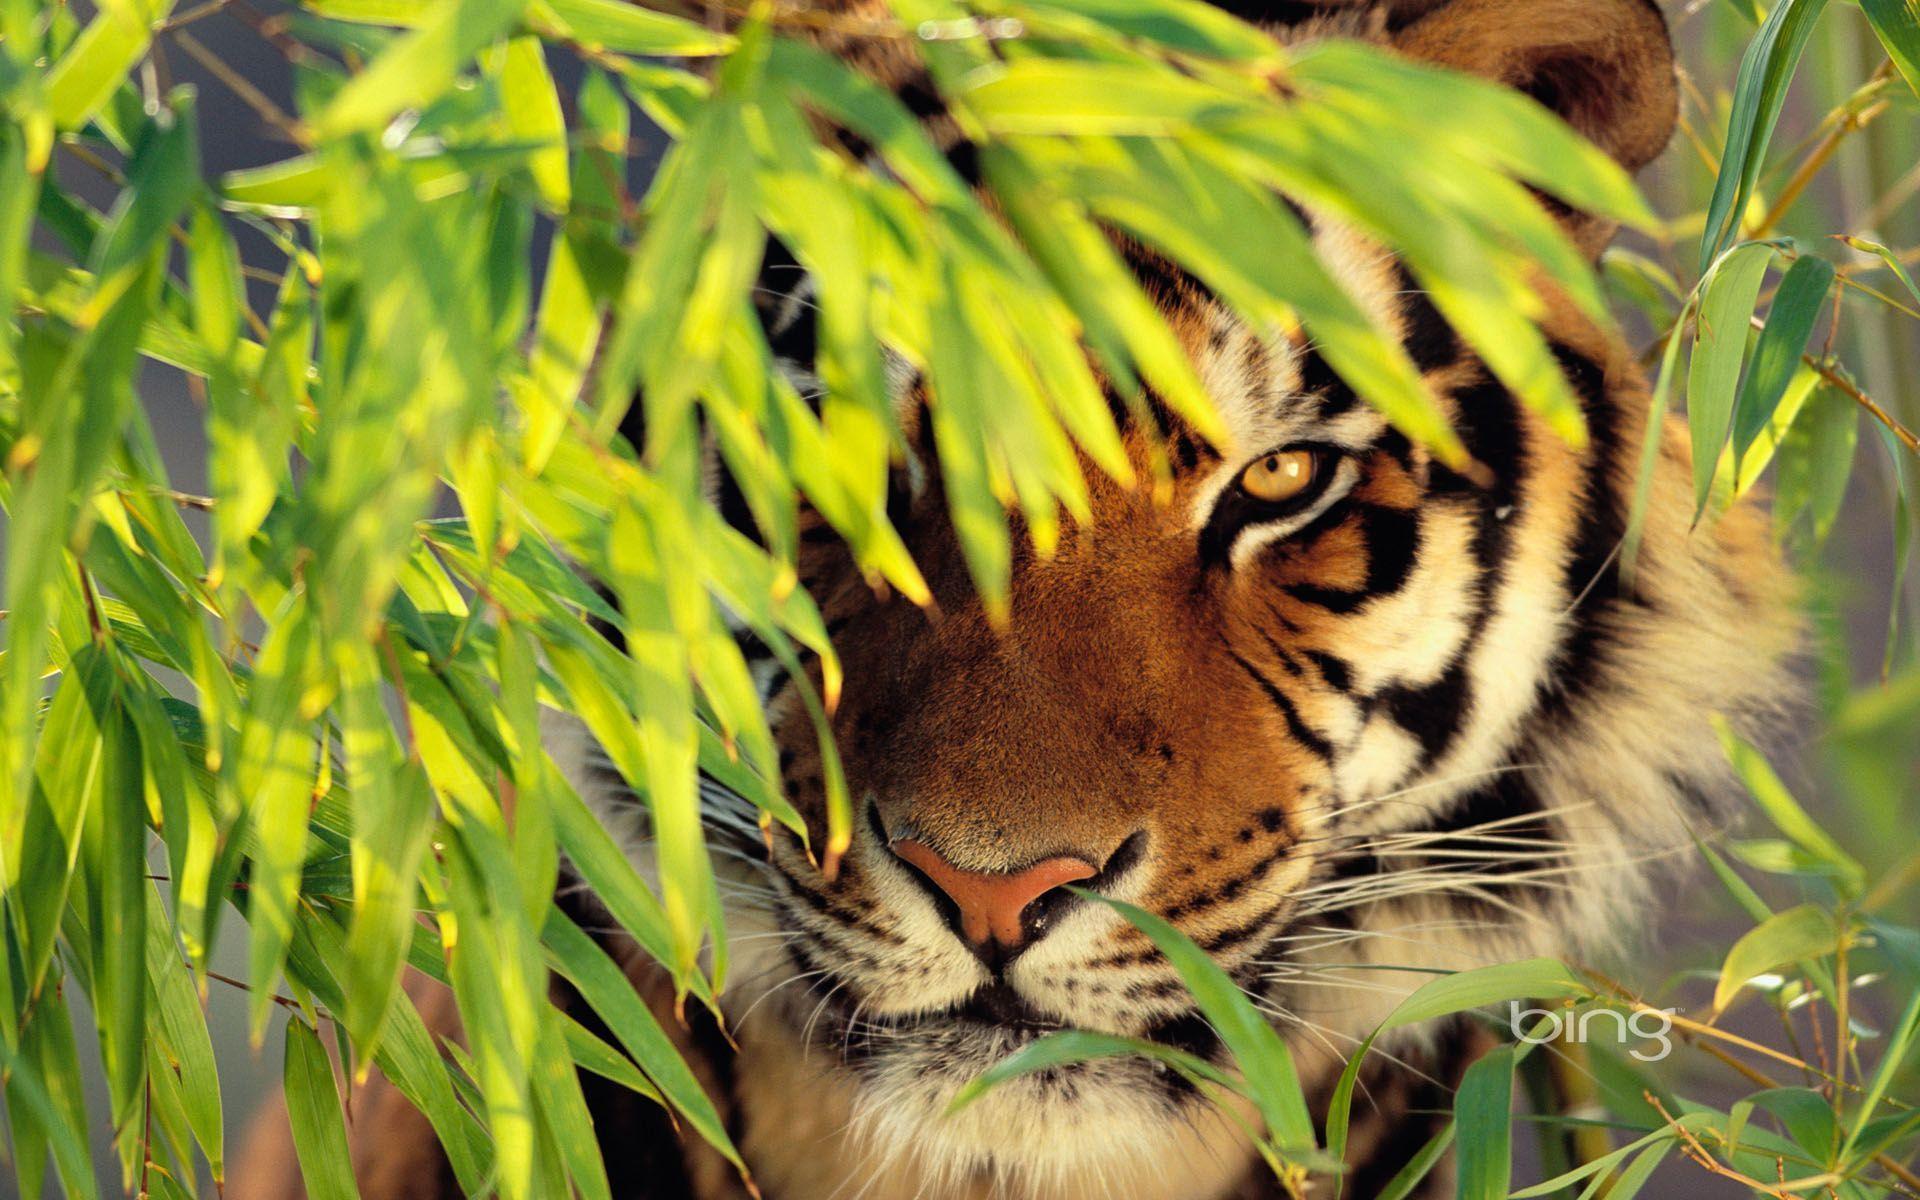 Tiger Desktop Wallpapers Top Free Tiger Desktop